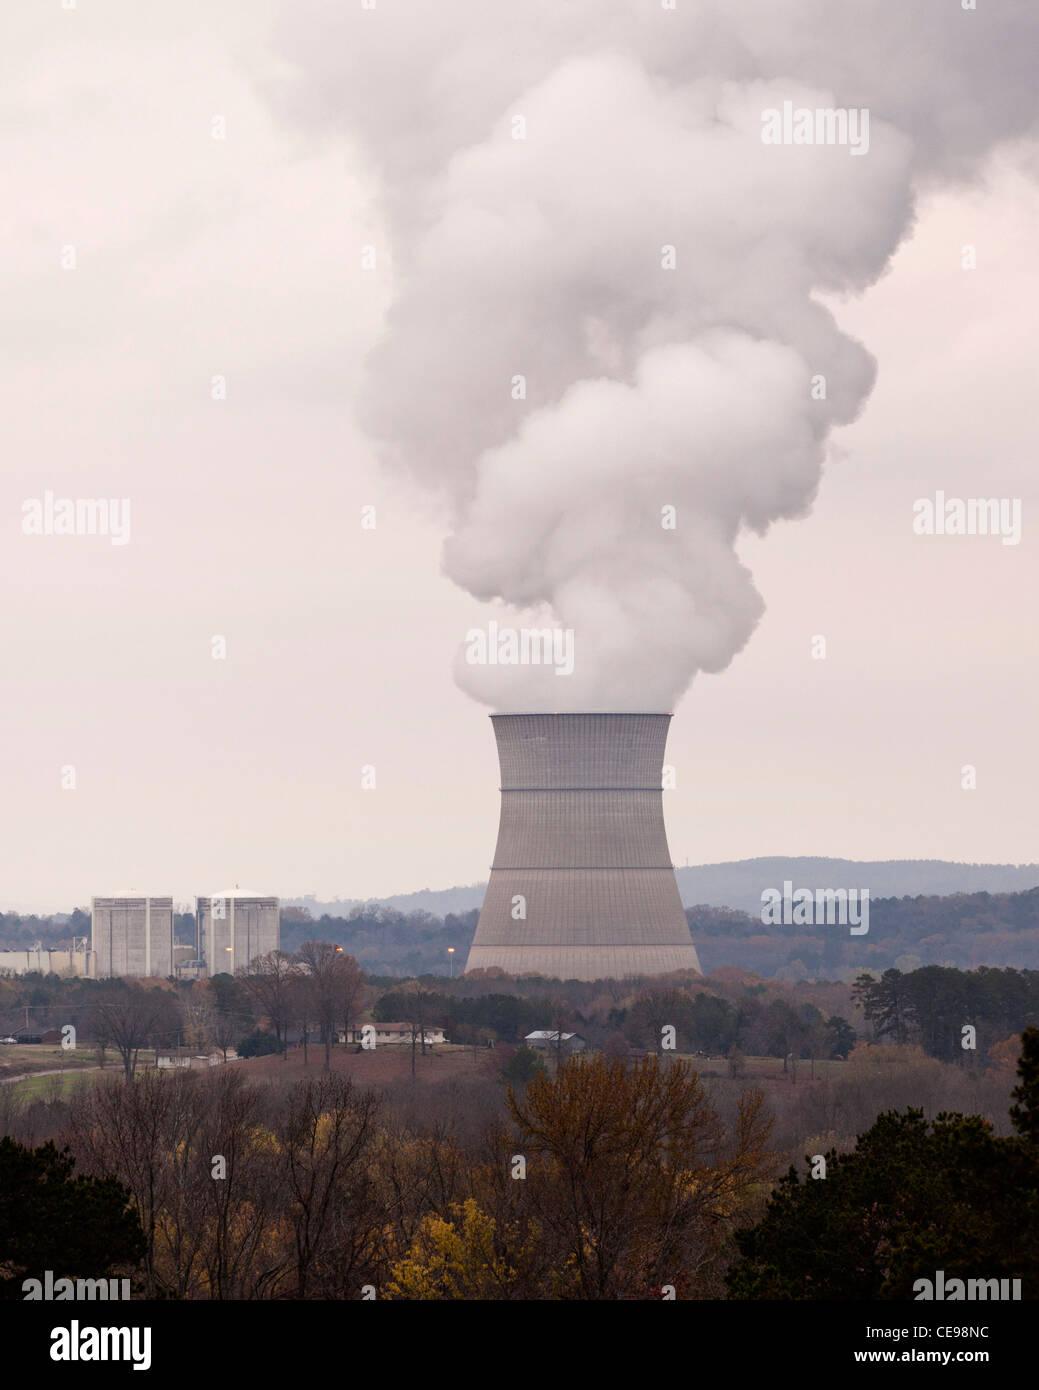 Arkansas Nuclear One power plant - Russellville, Arkansas USA - Stock Image